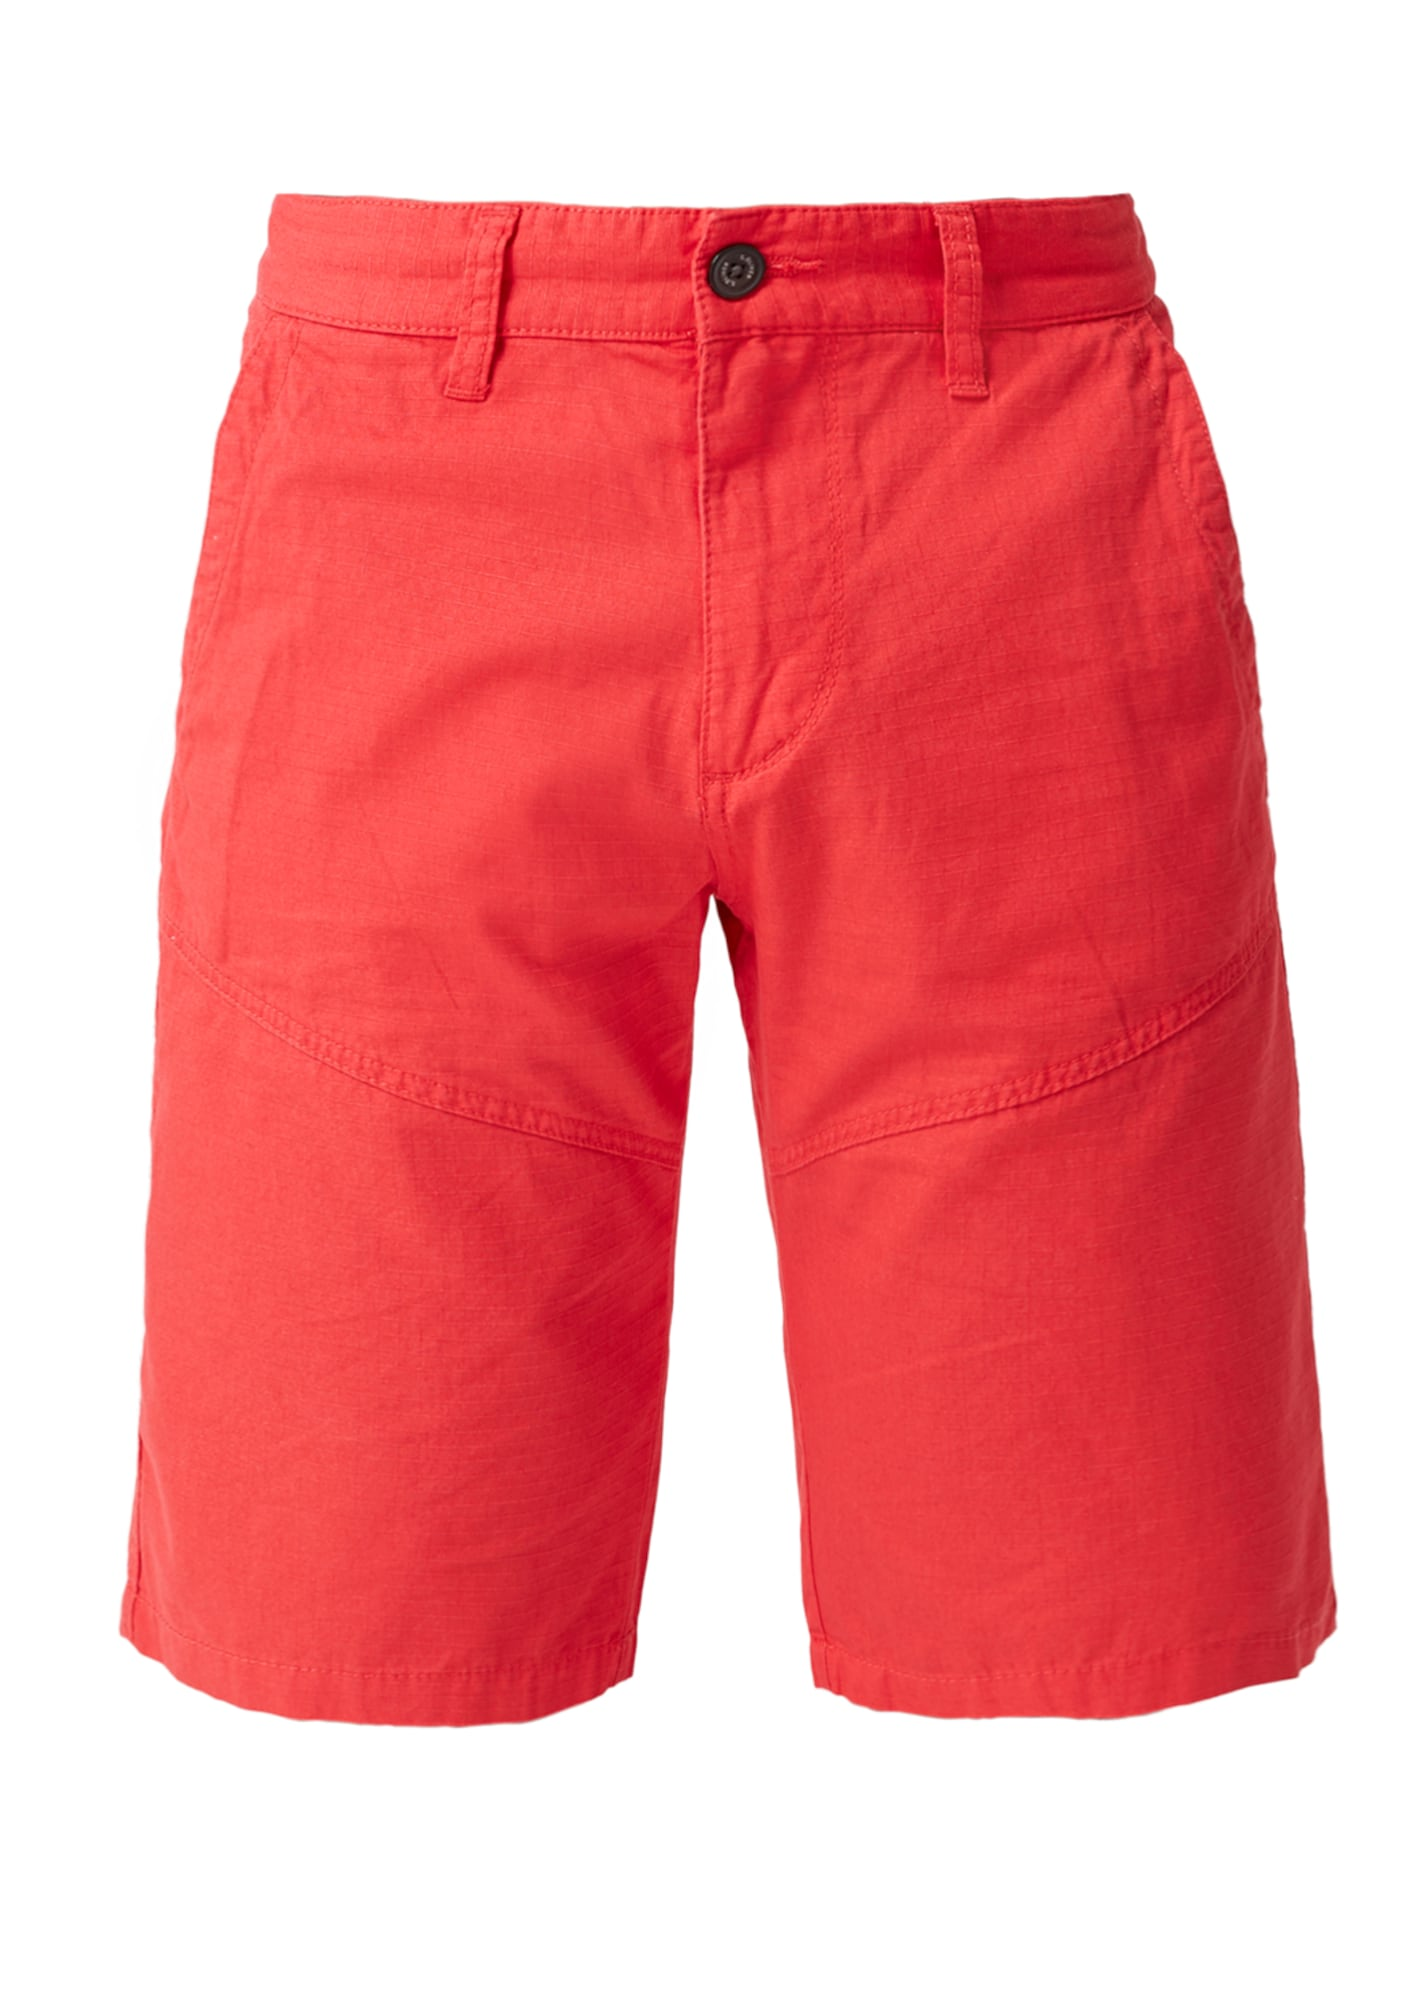 Bermuda | Bekleidung > Shorts & Bermudas > Bermudas | S.Oliver